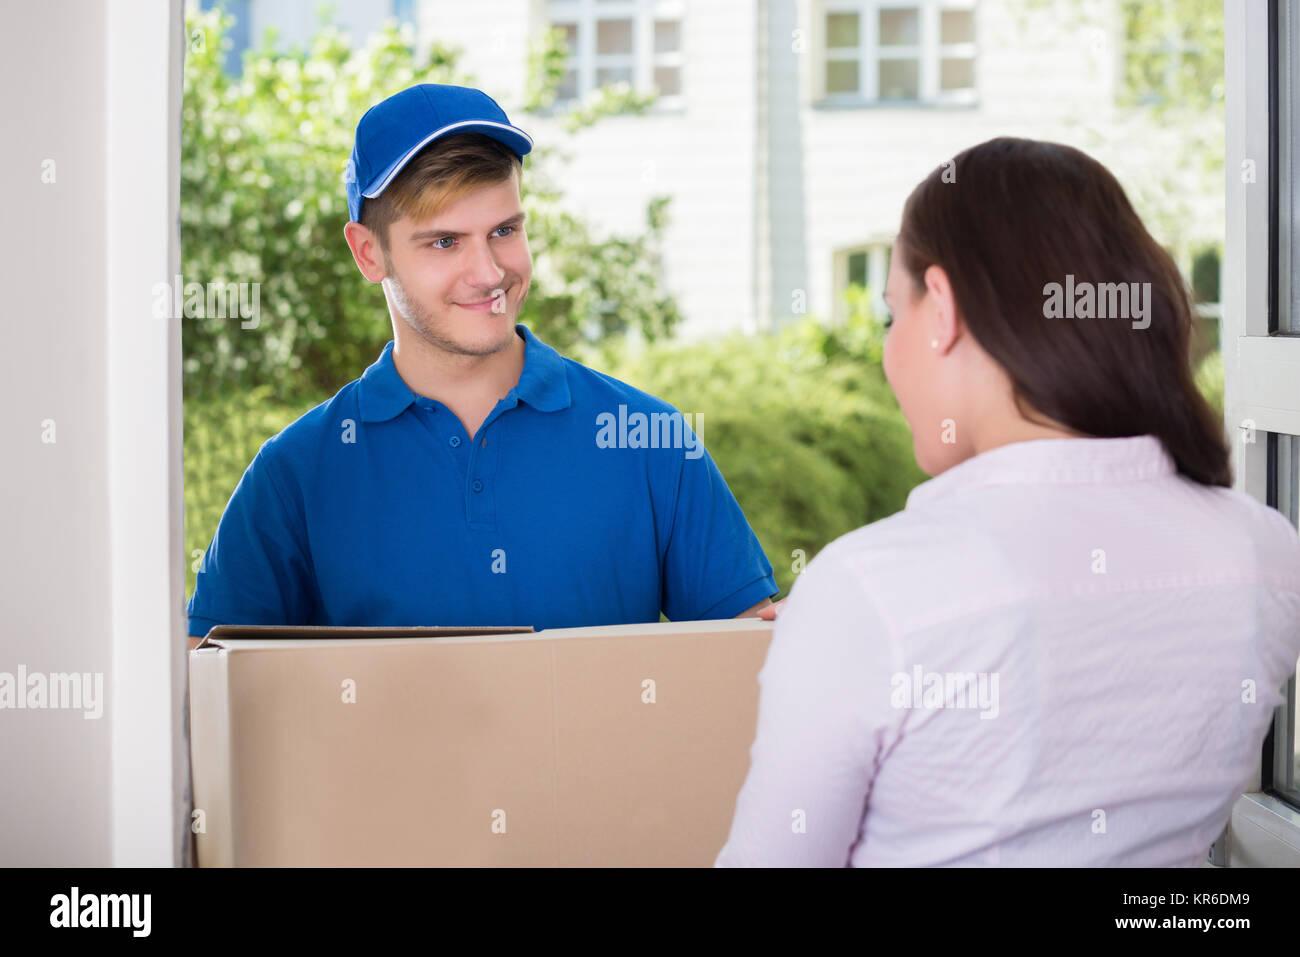 Happy Man Delivering Parcel - Stock Image